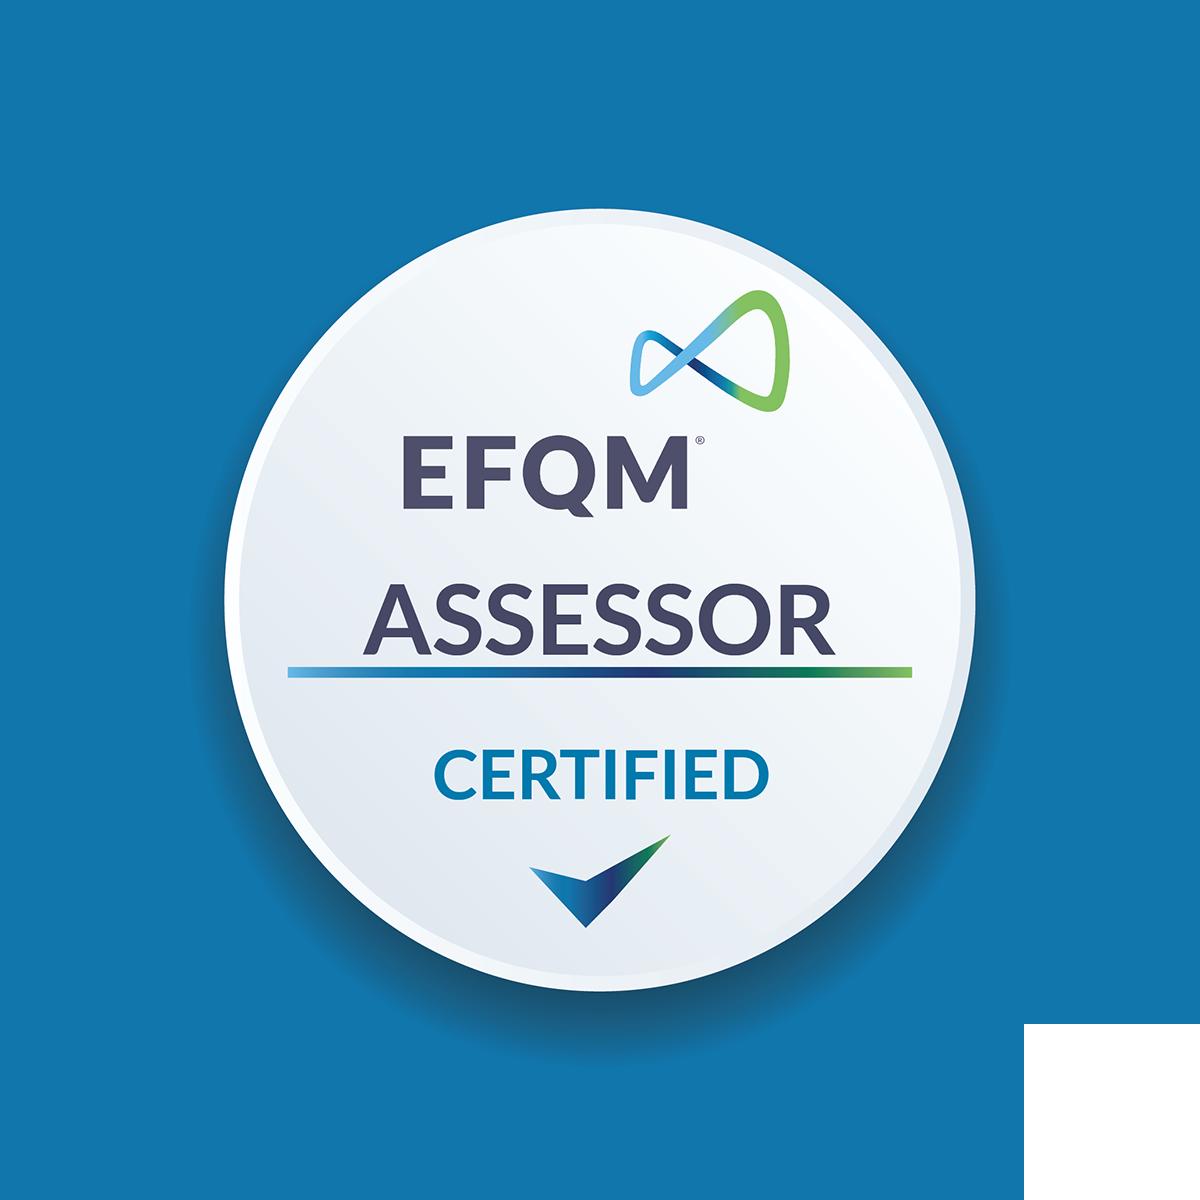 EFQM Assessor Certified